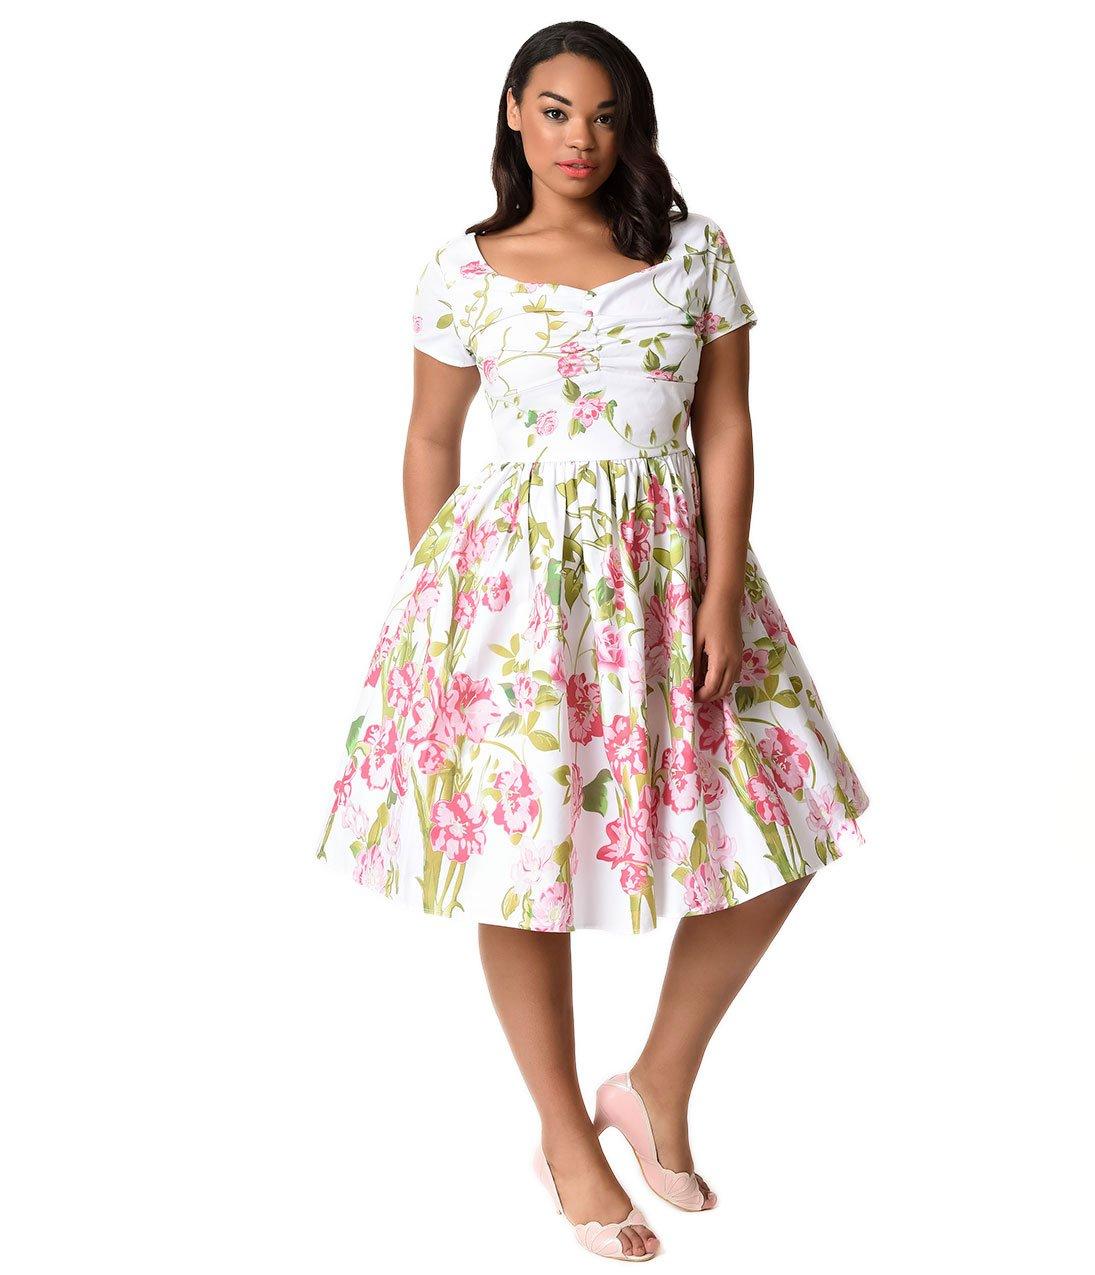 Unique Vintage Plus Size 1950s Style White & Pink Floral Short Sleeve Whitman Swing Dress